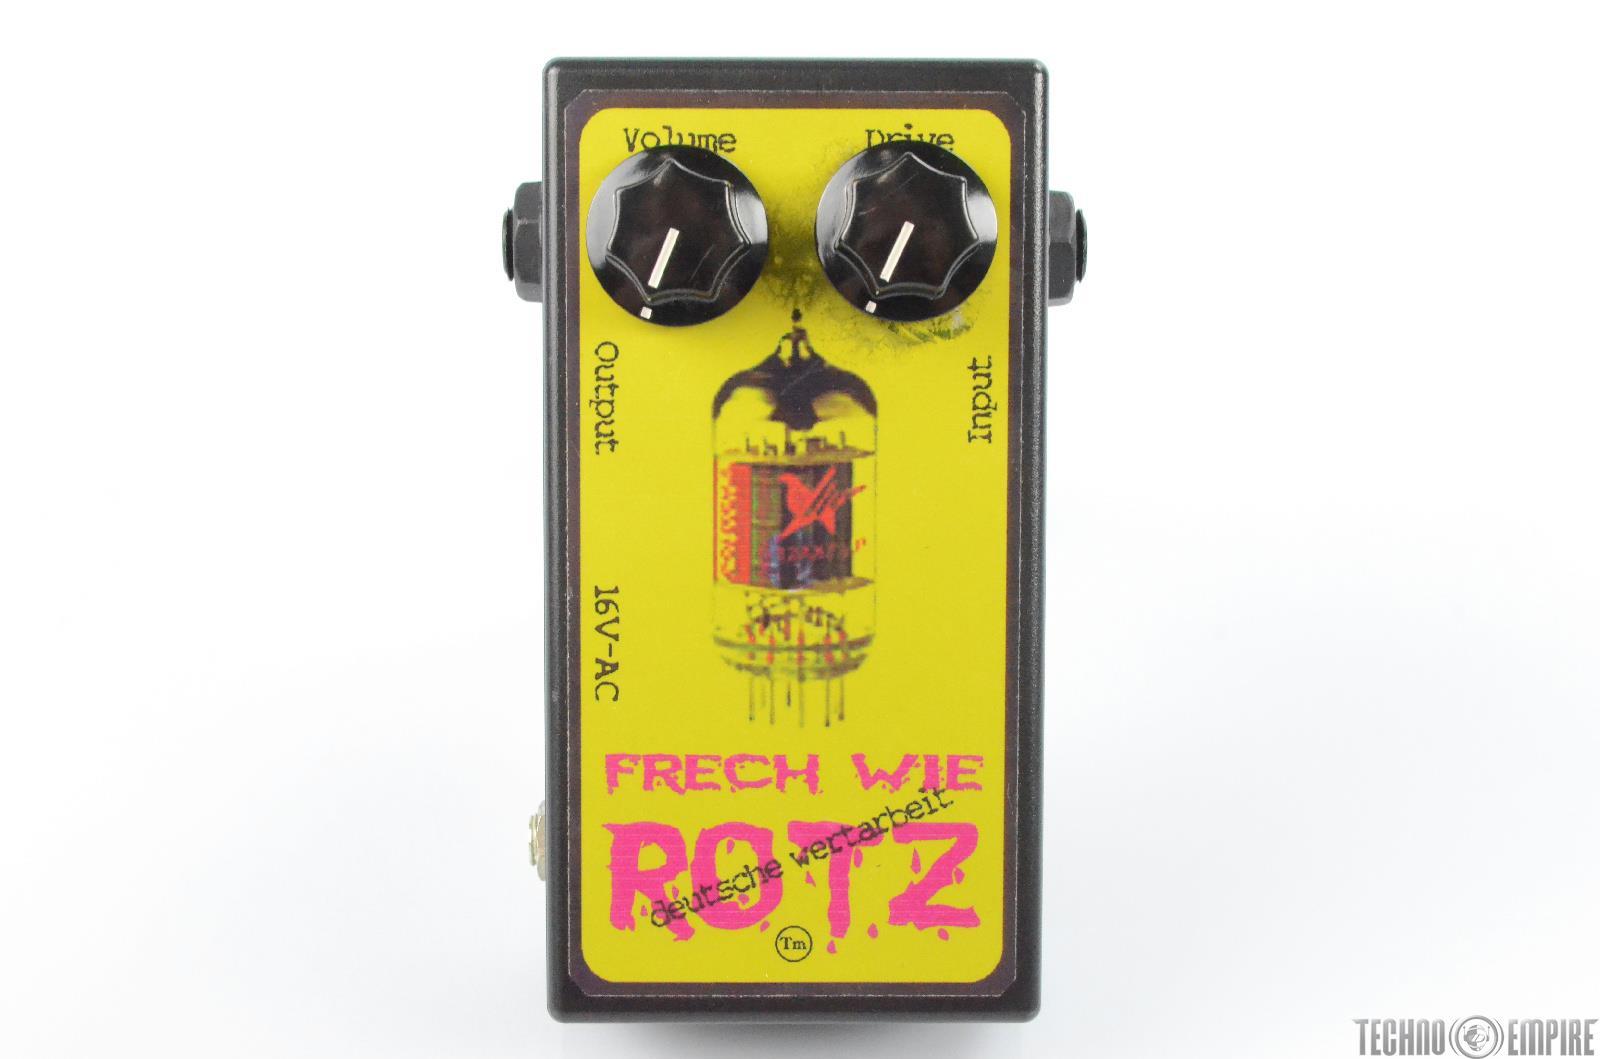 Horst Frech Wie Rotz Tube Preamp Guitar Pedal w/ Power Supply PSU #29708